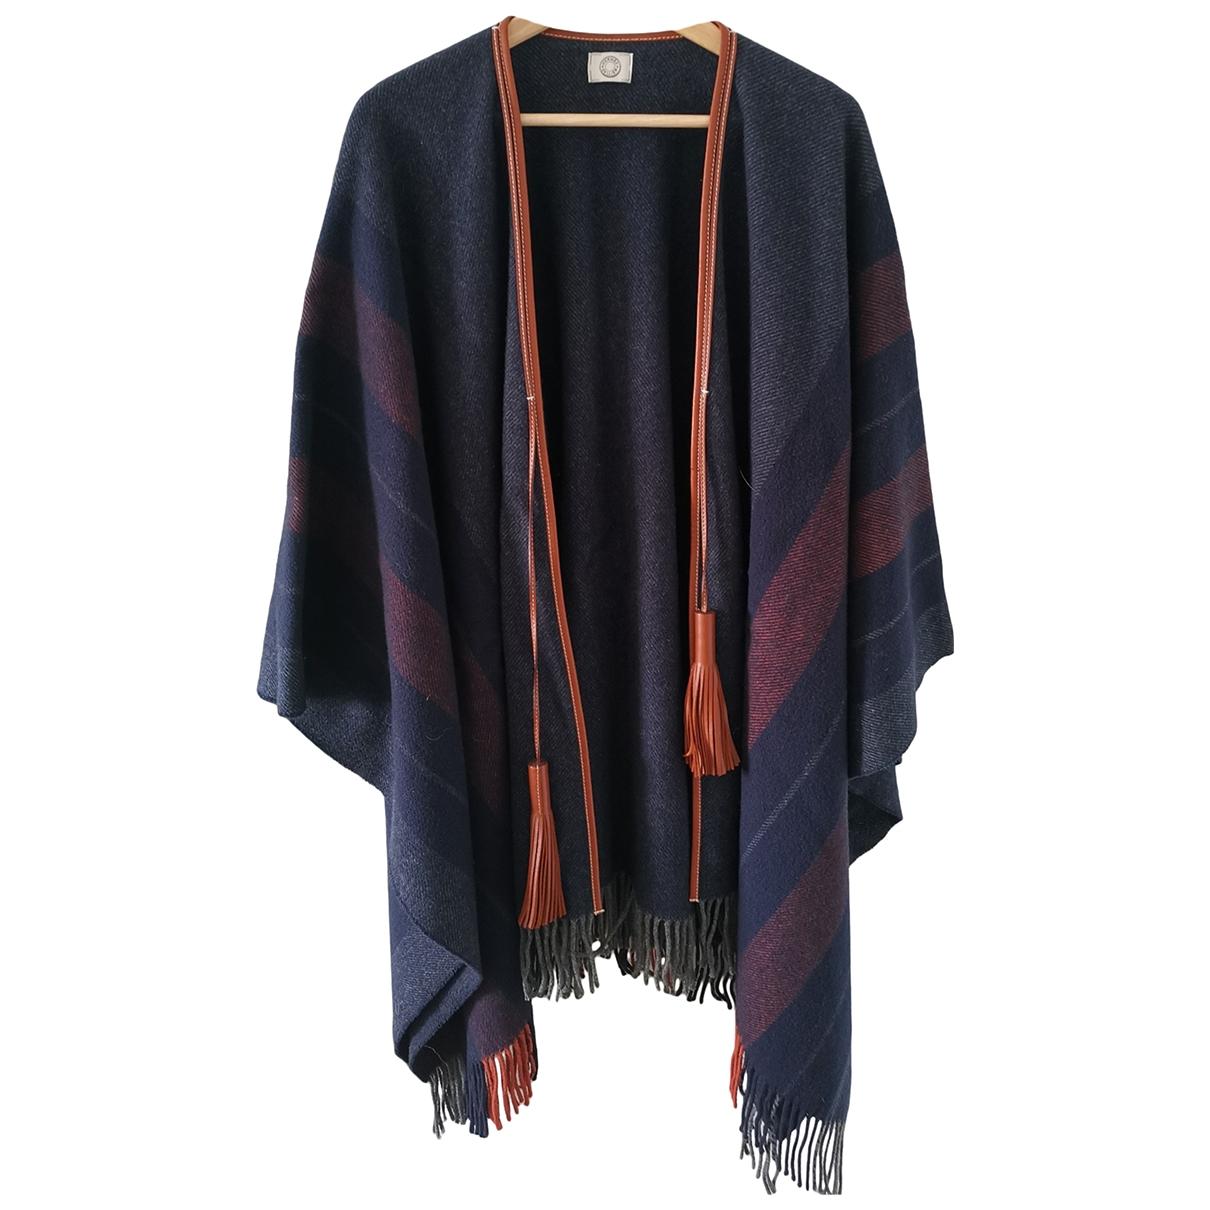 Hermes - Pull   pour femme en laine - violet